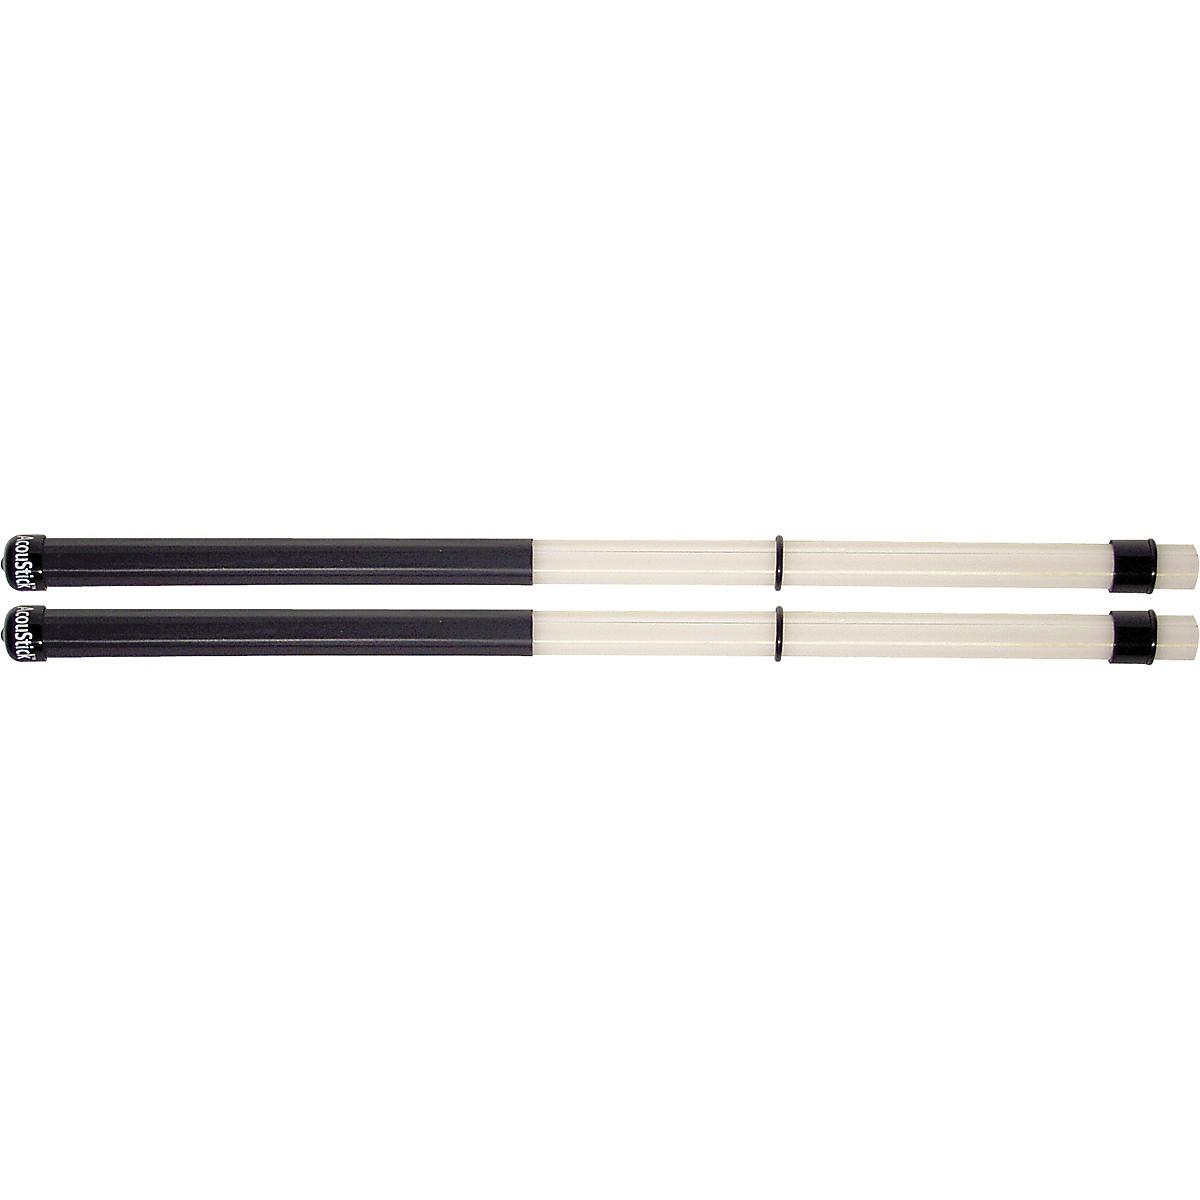 Vater Acoustick Sticks